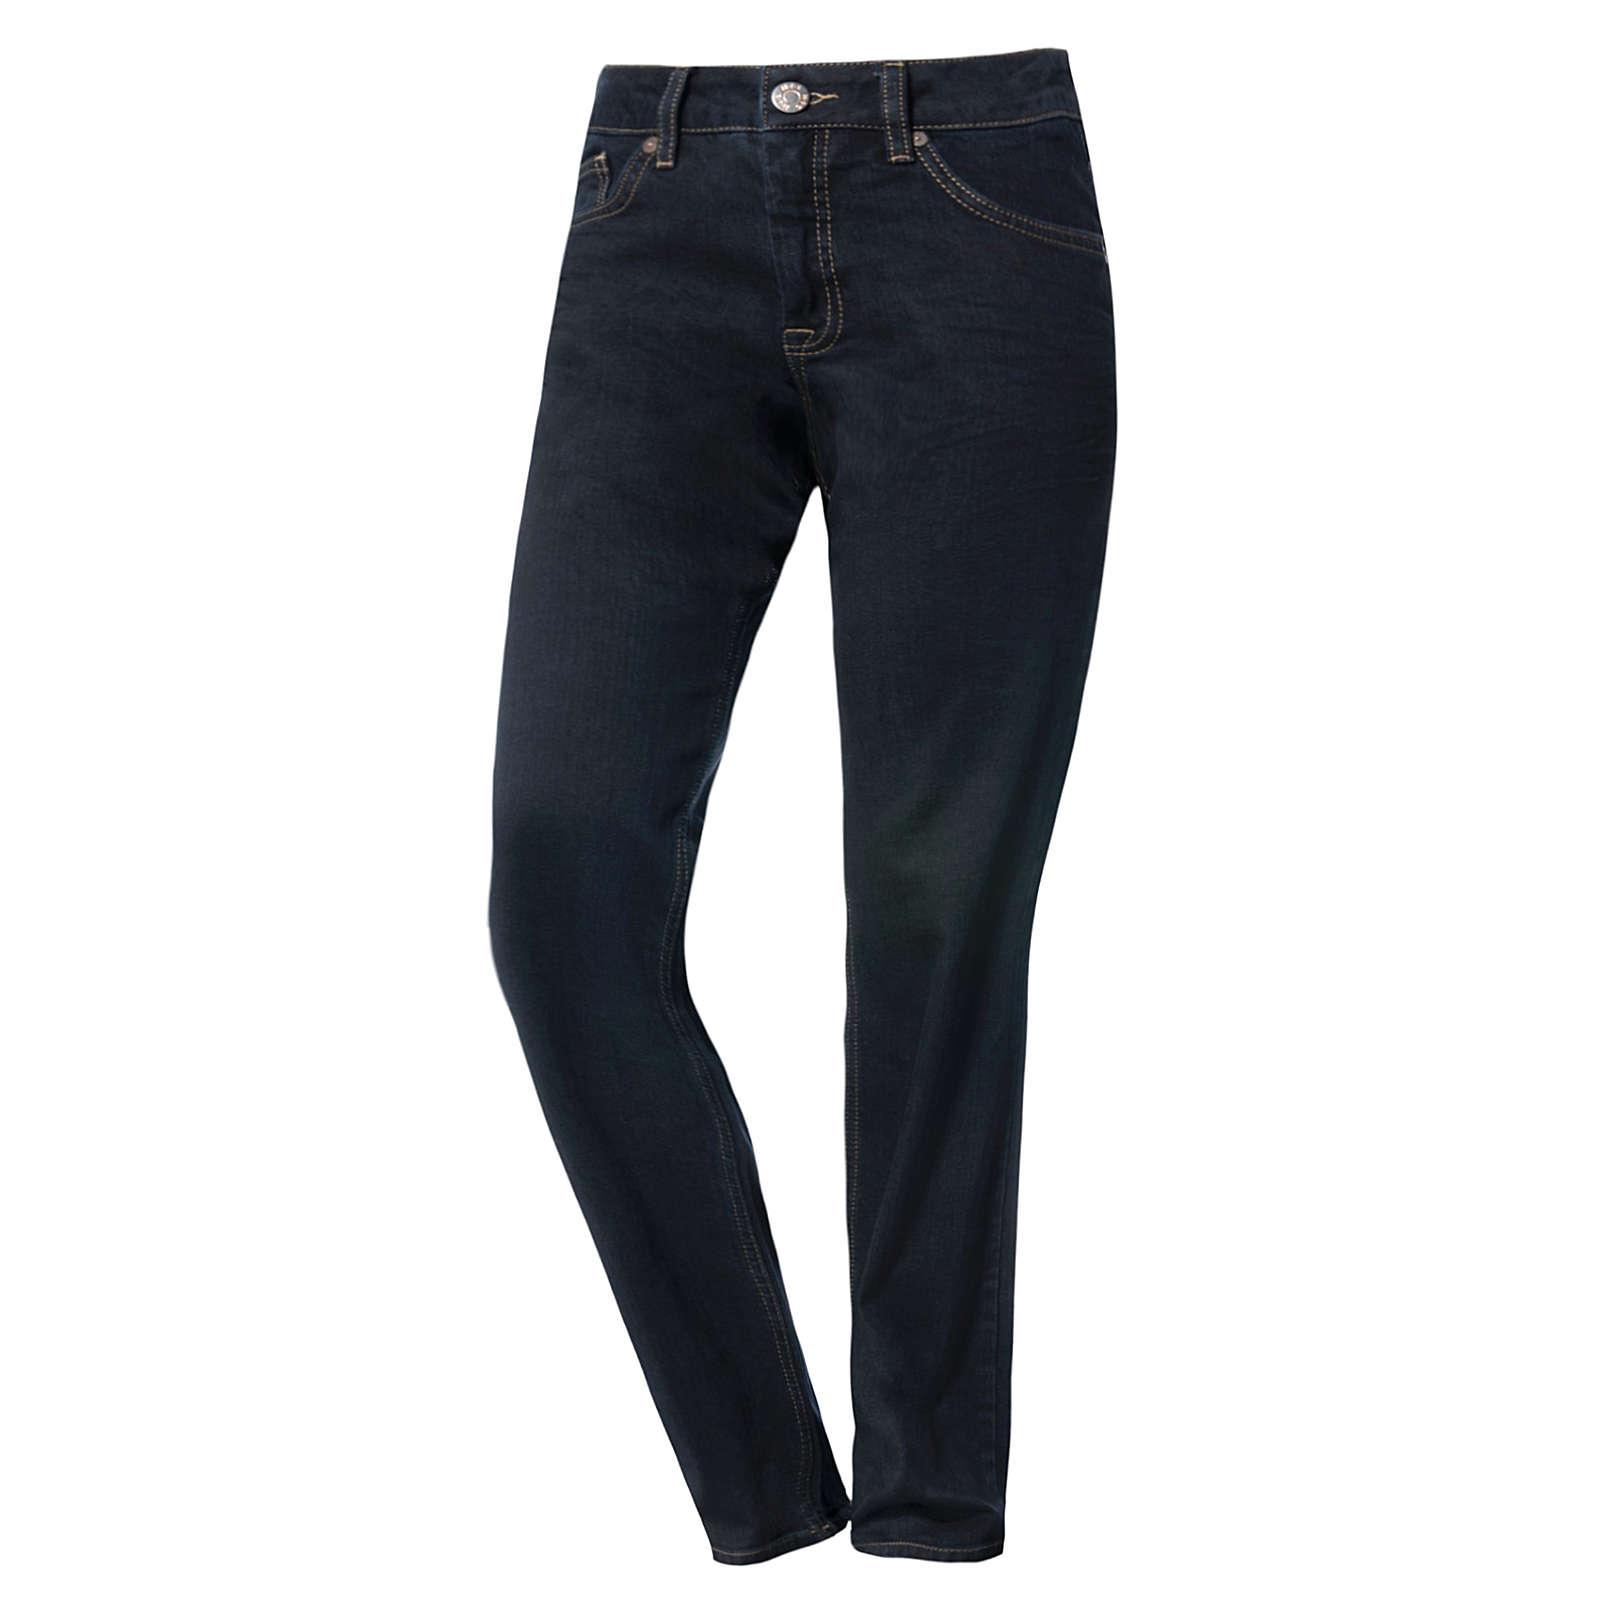 H.I.S. Jeans Straight Leg dark blue denim Damen Gr. 34/L33